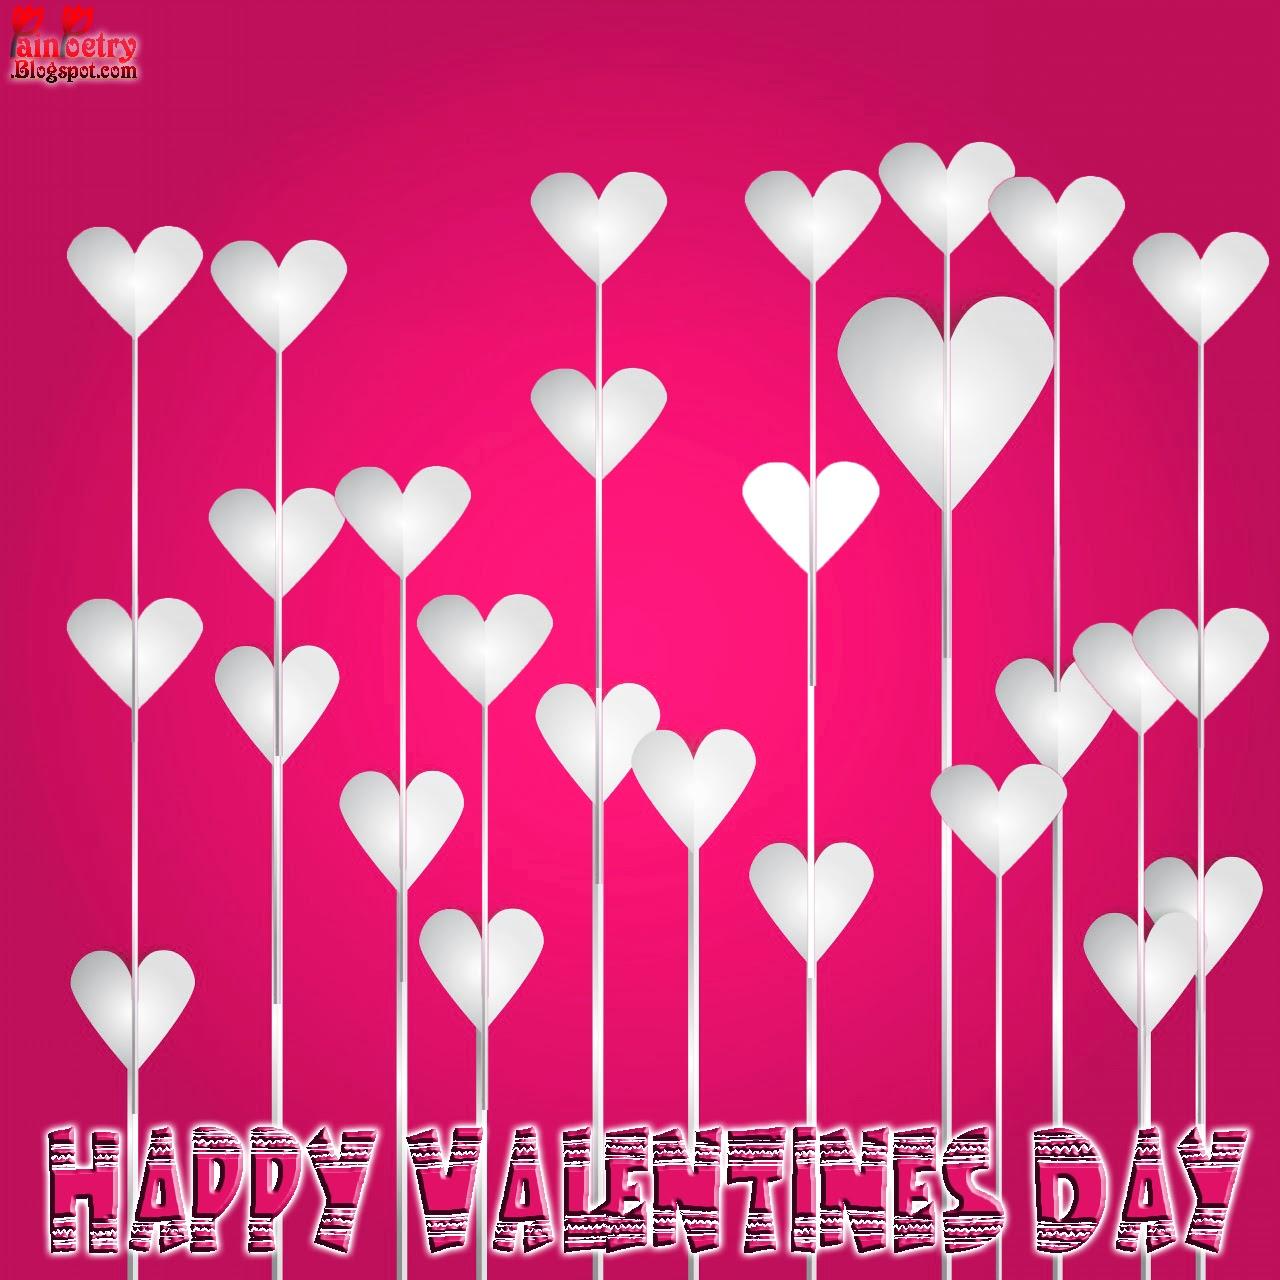 Happy-Walentines-Day-Hearts-Globe-Lights-HD